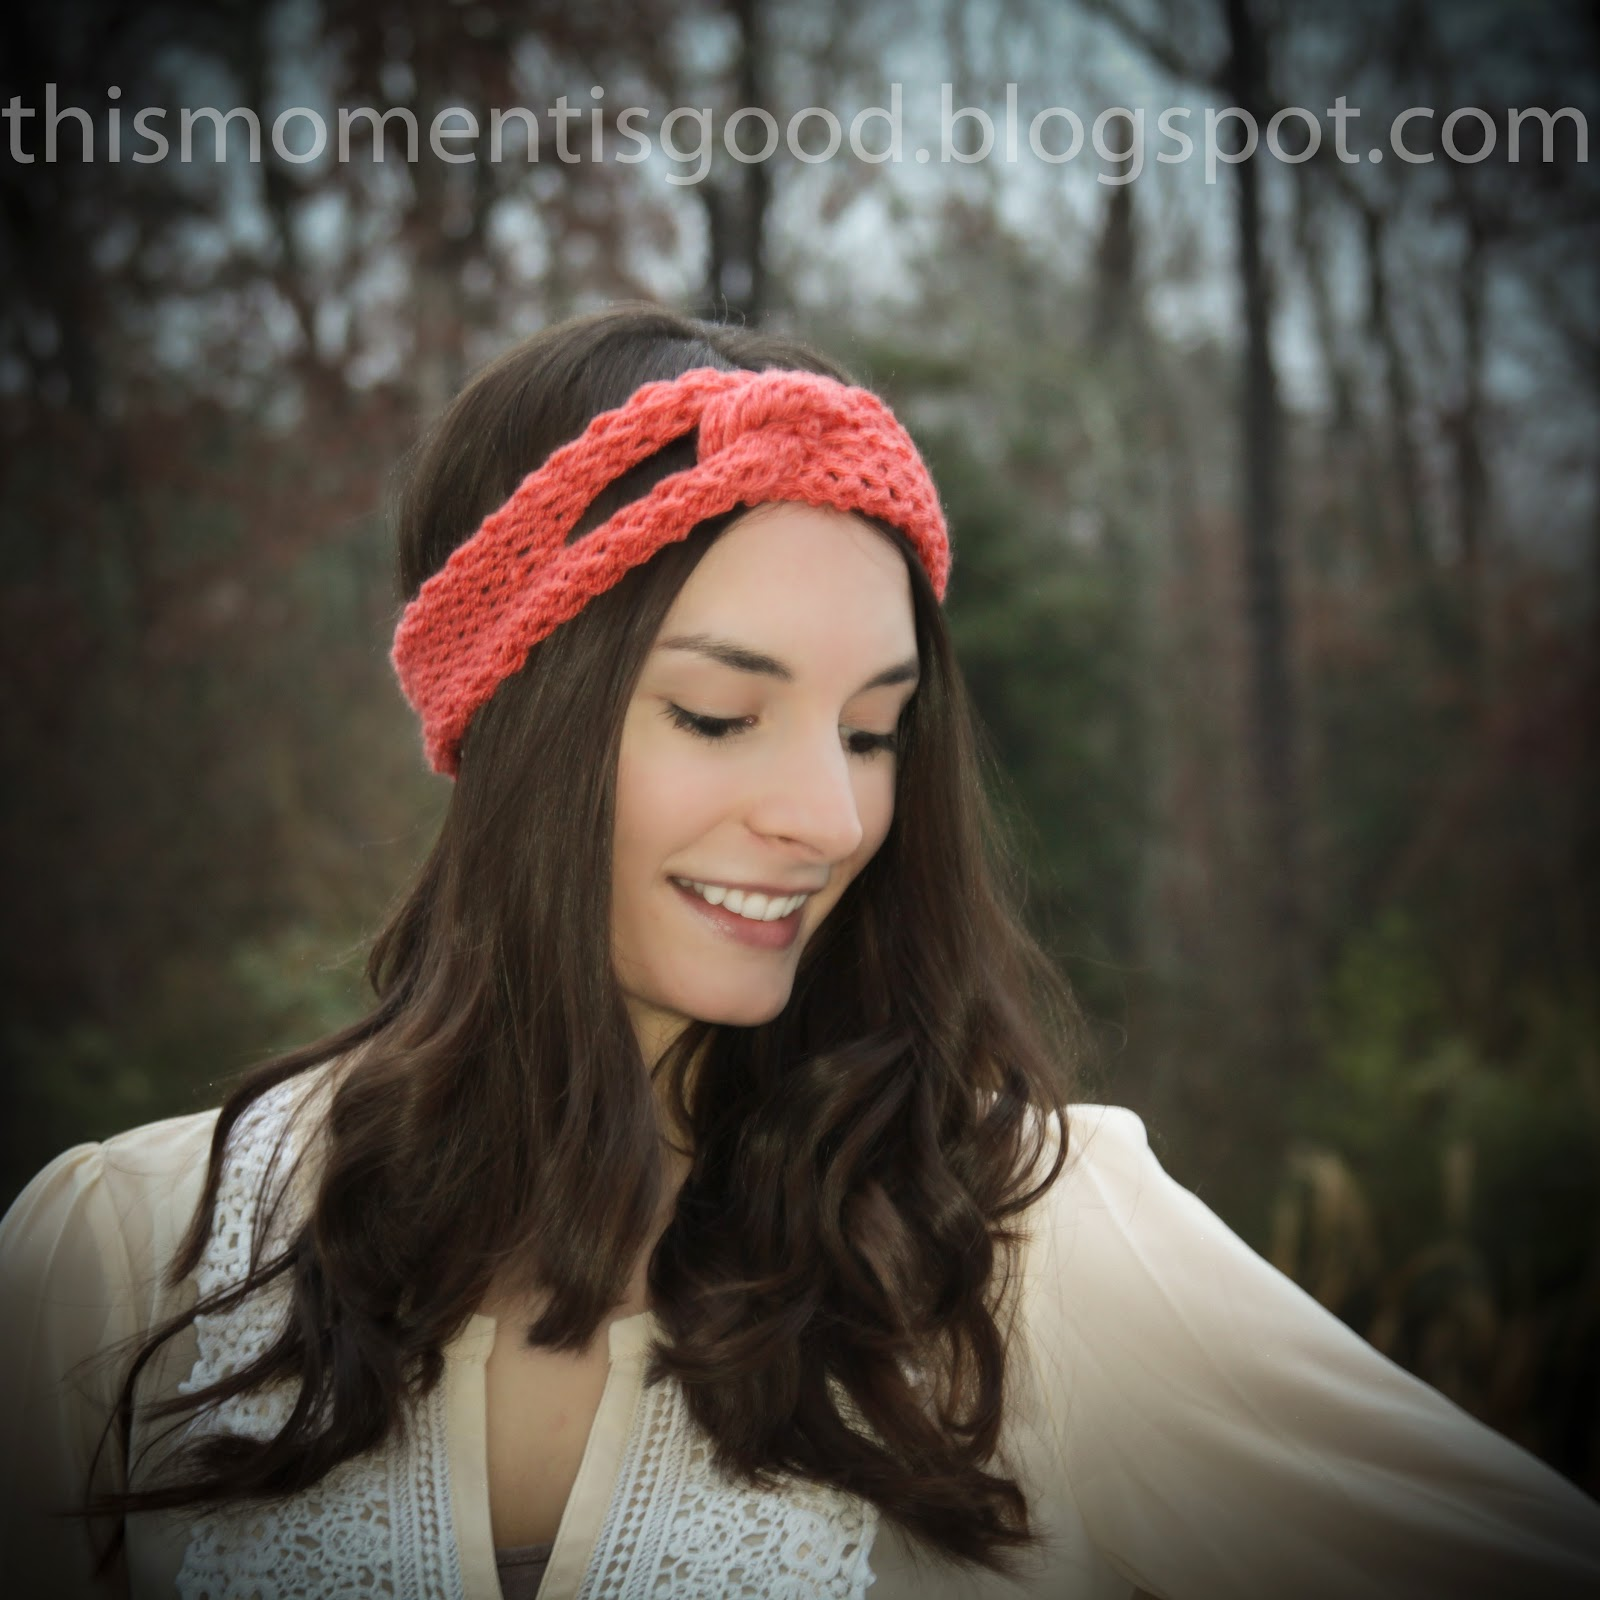 Free Knitting Pattern Twisted Headband : Loom Knitting by This Moment is Good!: LOOM KNIT TWISTED ...